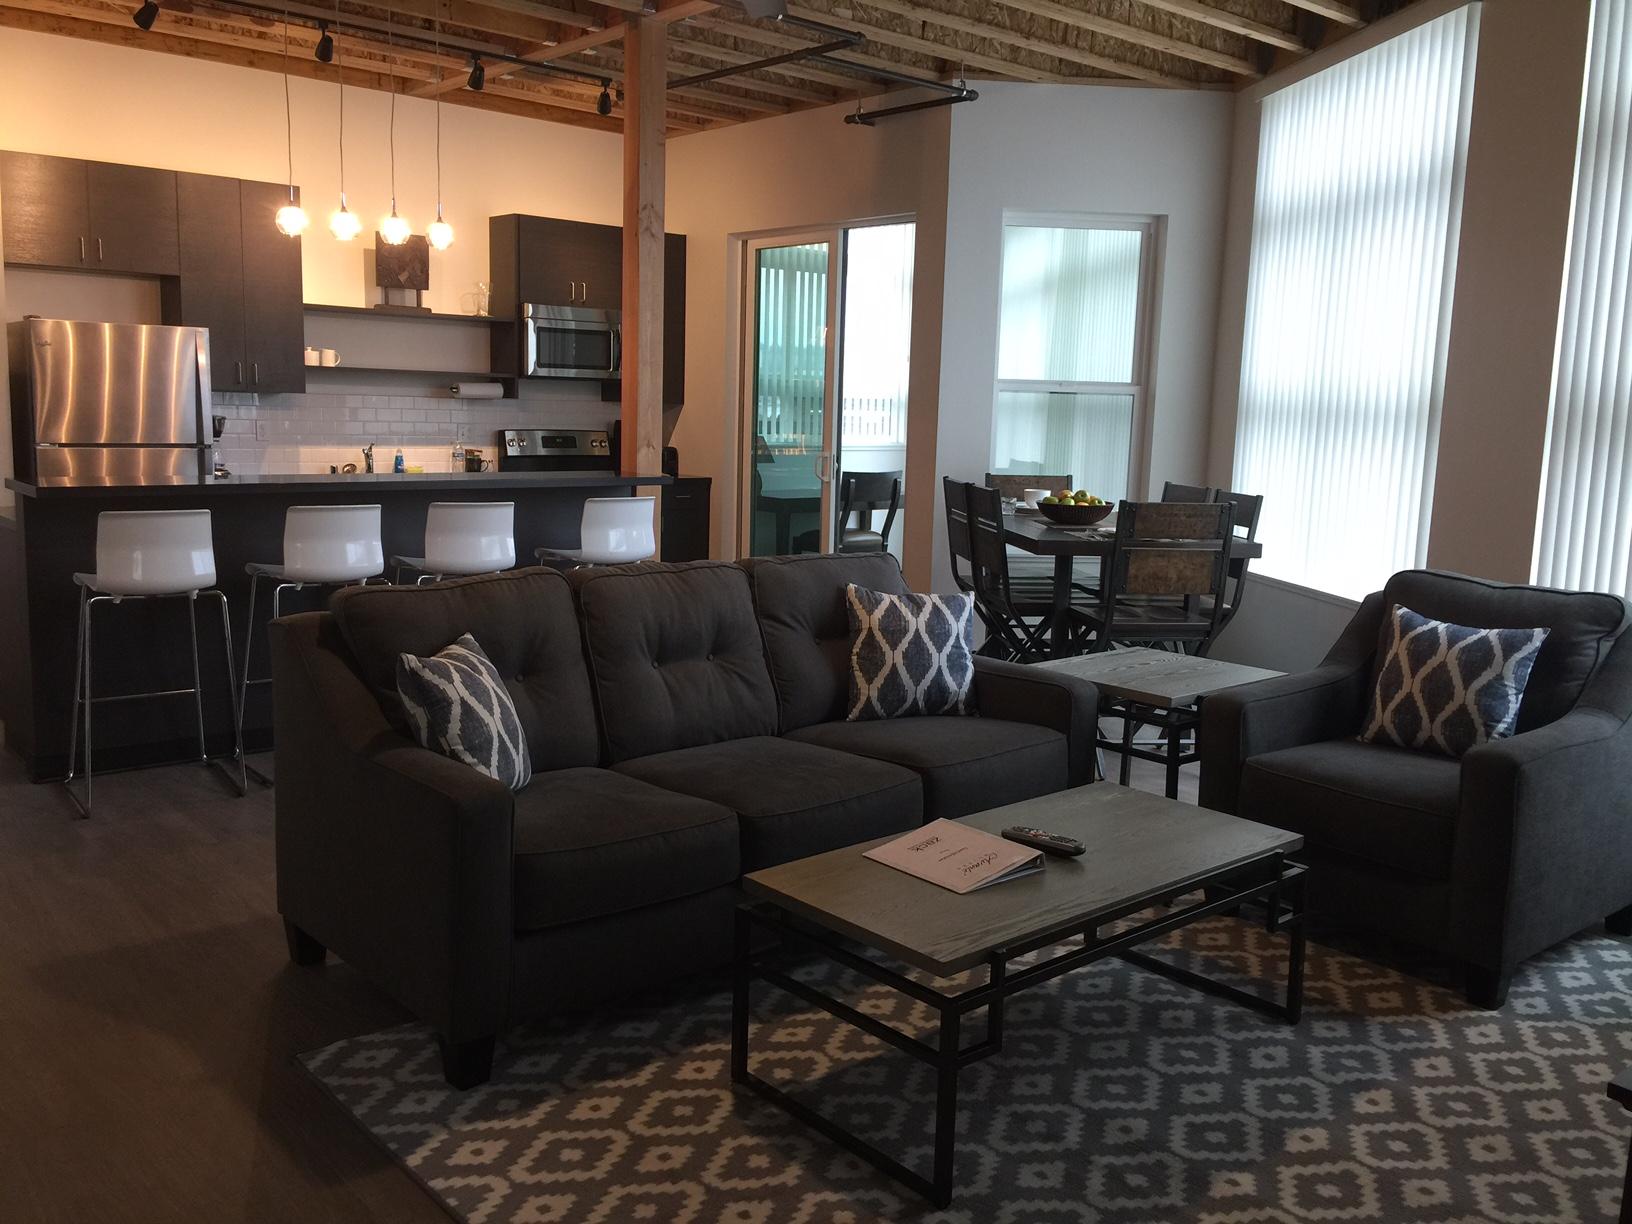 chung 1 livingroom 2.JPG